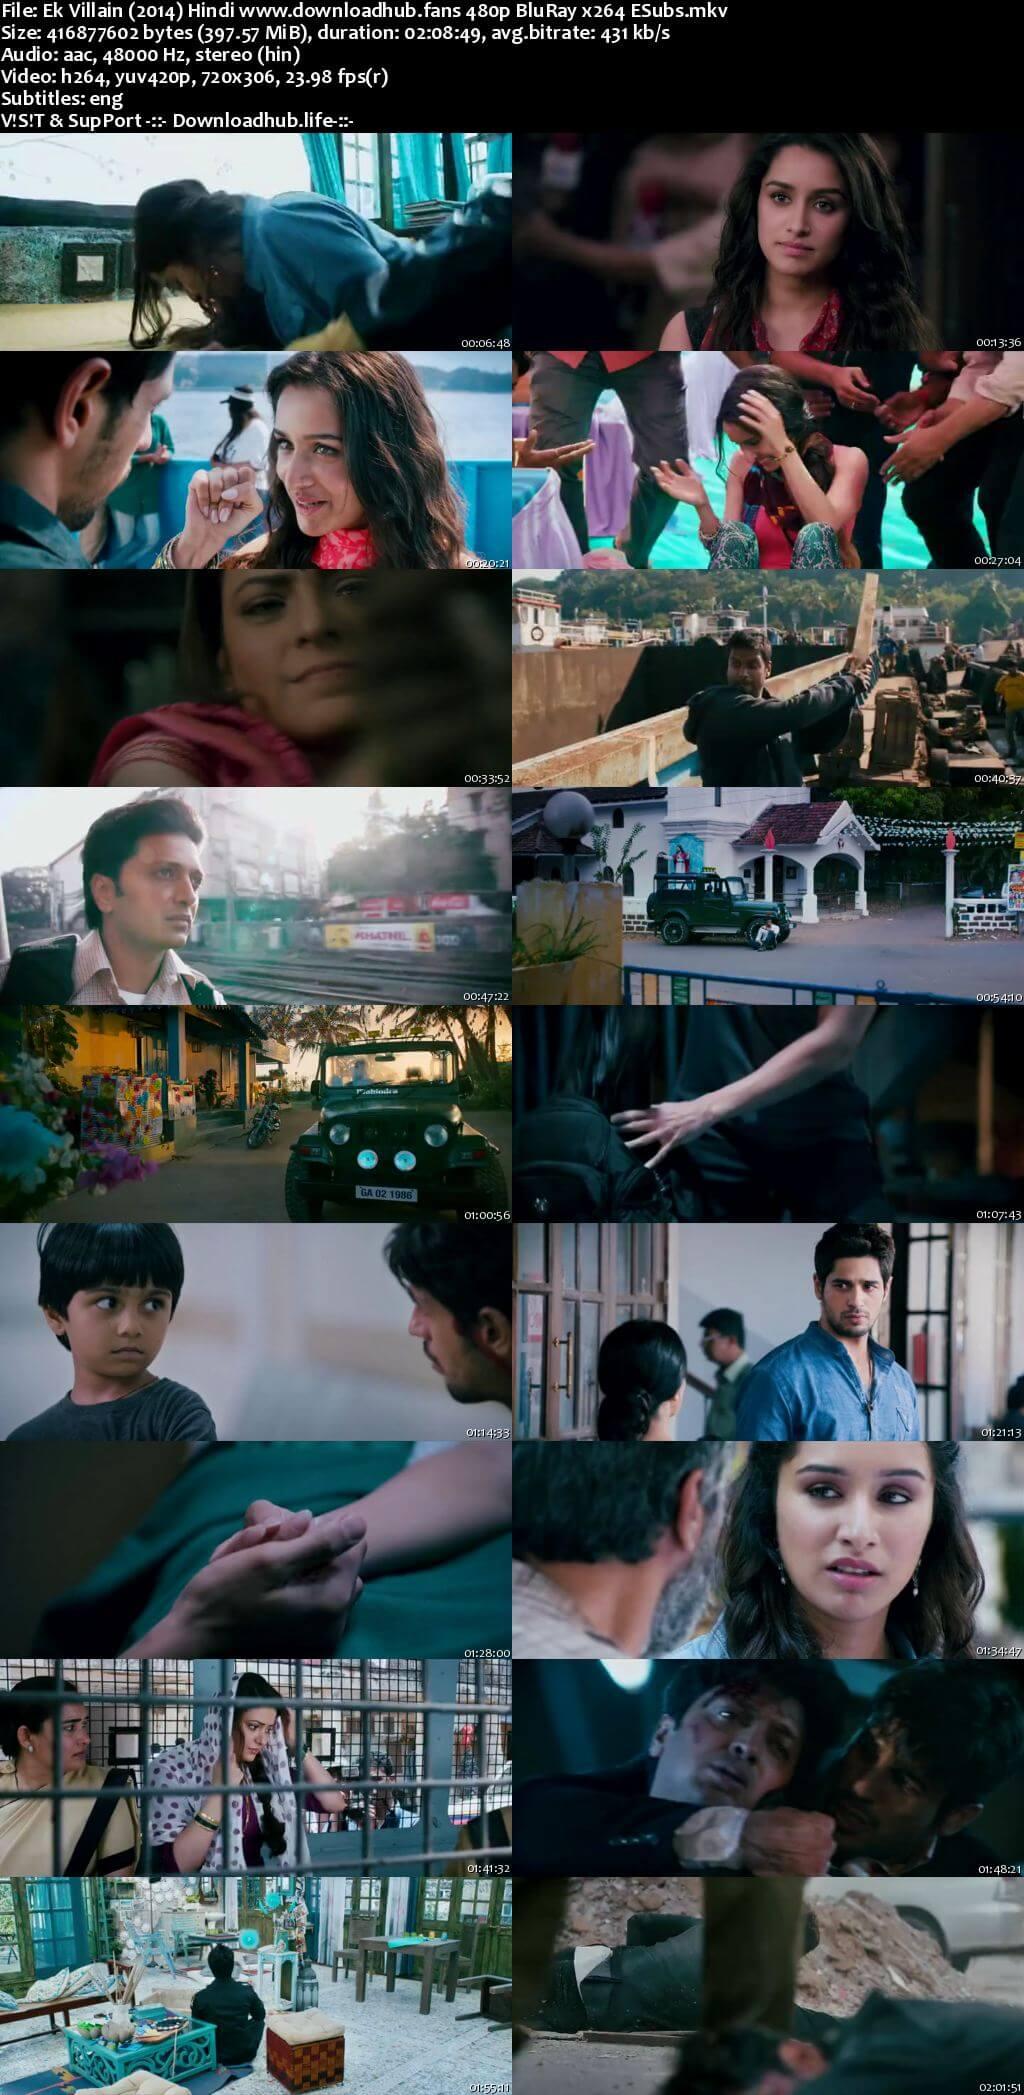 Ek Villain 2014 Hindi 400MB BluRay 480p ESubs